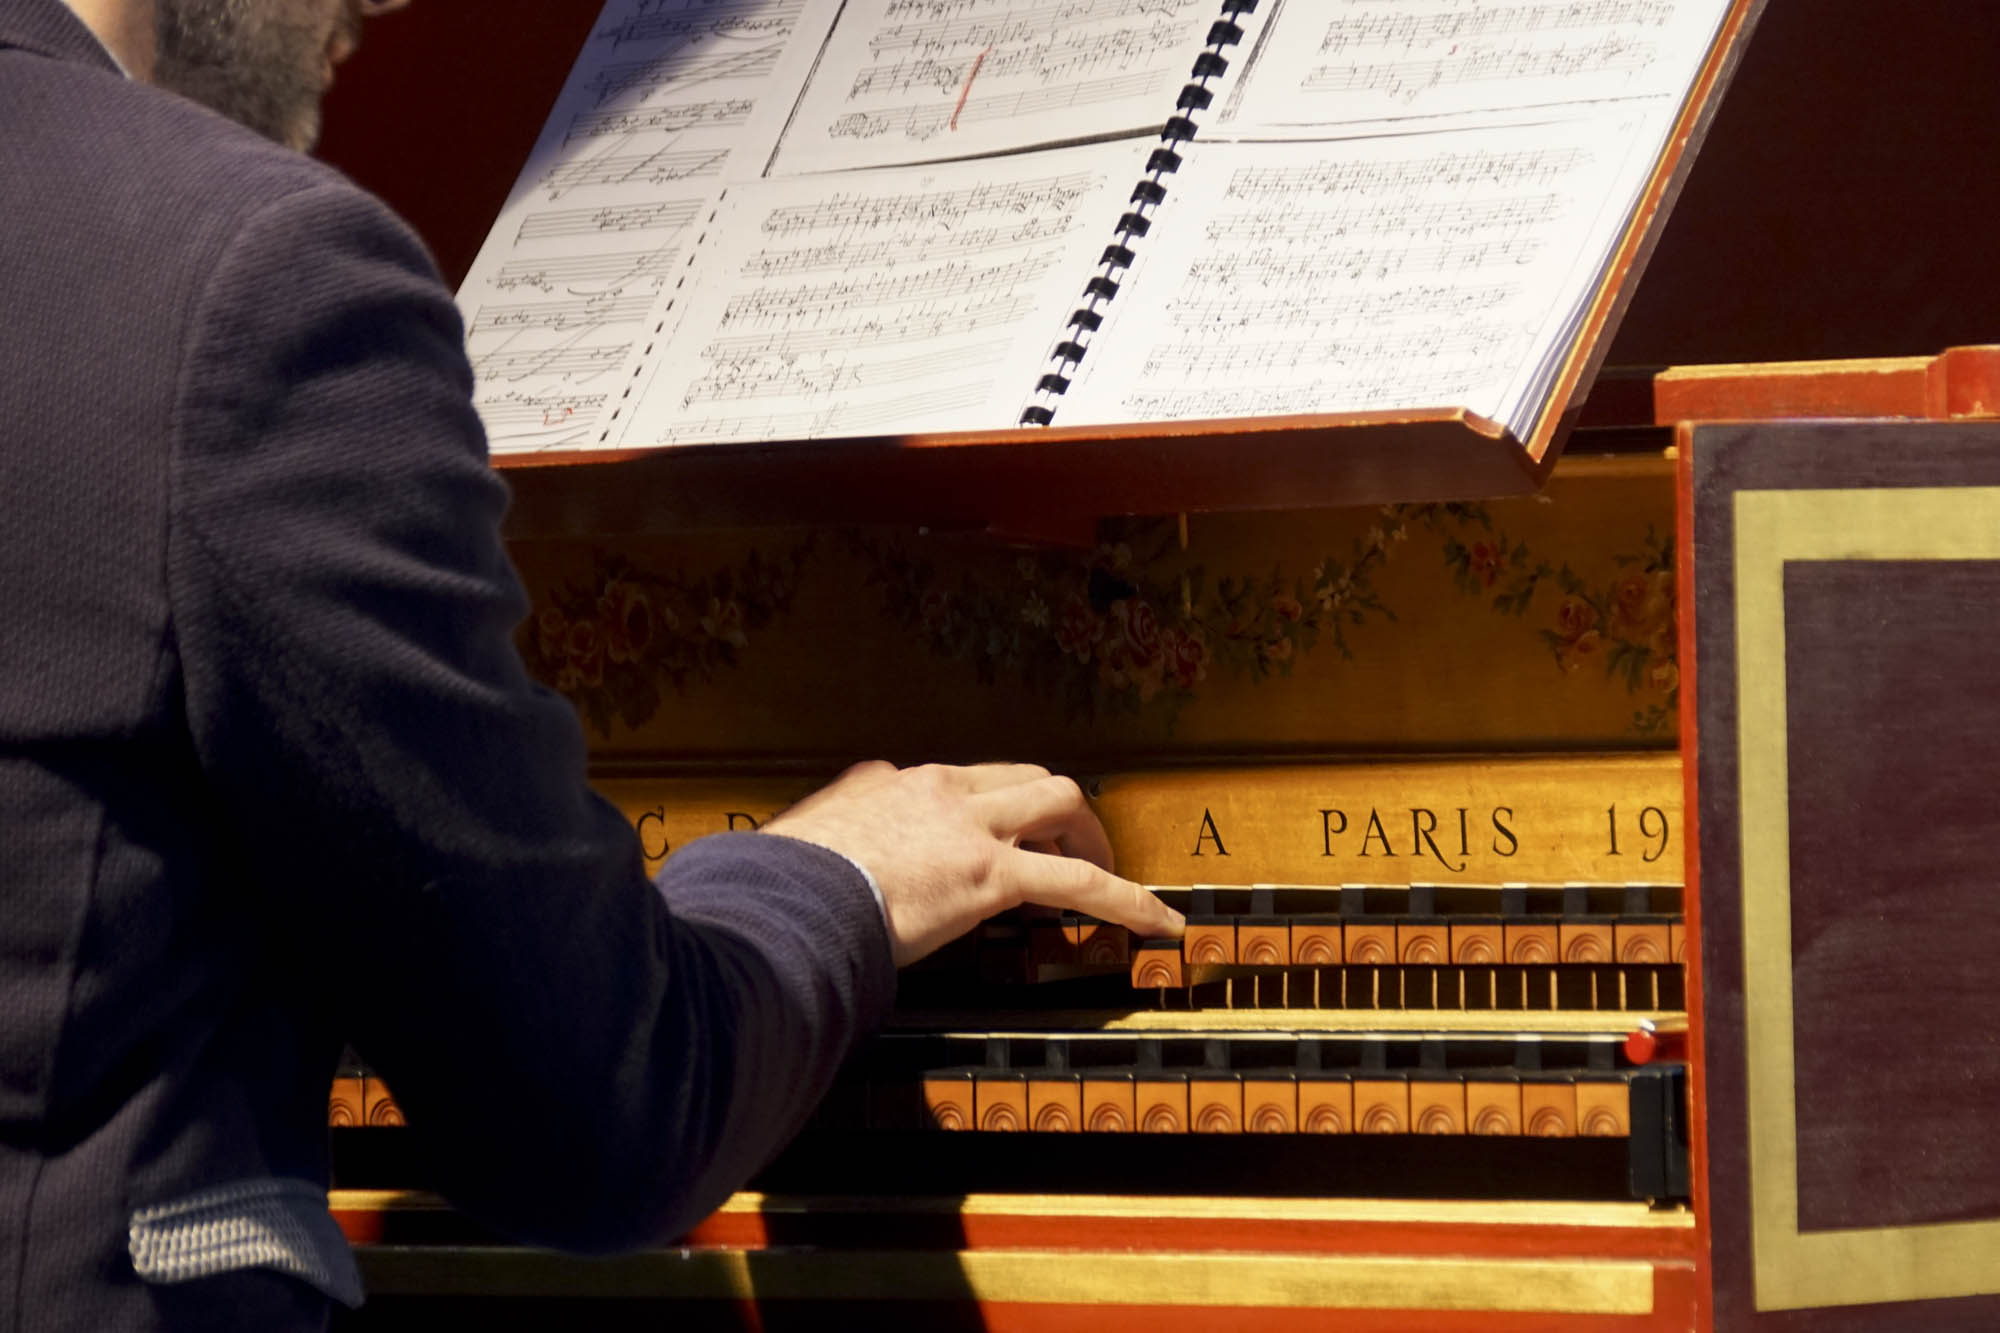 instant Frescobaldi - clavecin